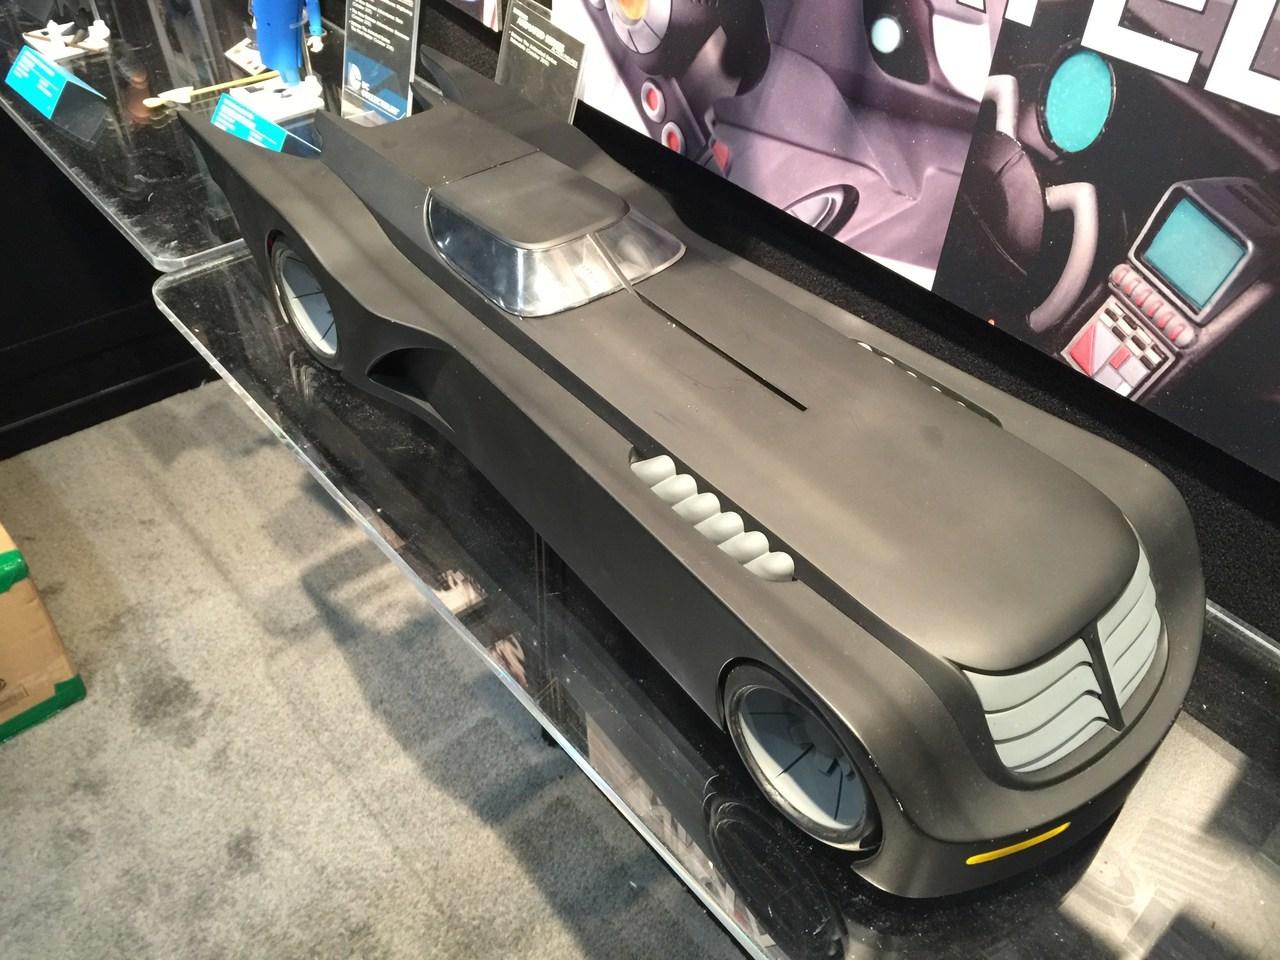 batman-the-animated-series-batmobile-vehicle-with-lights.jpg